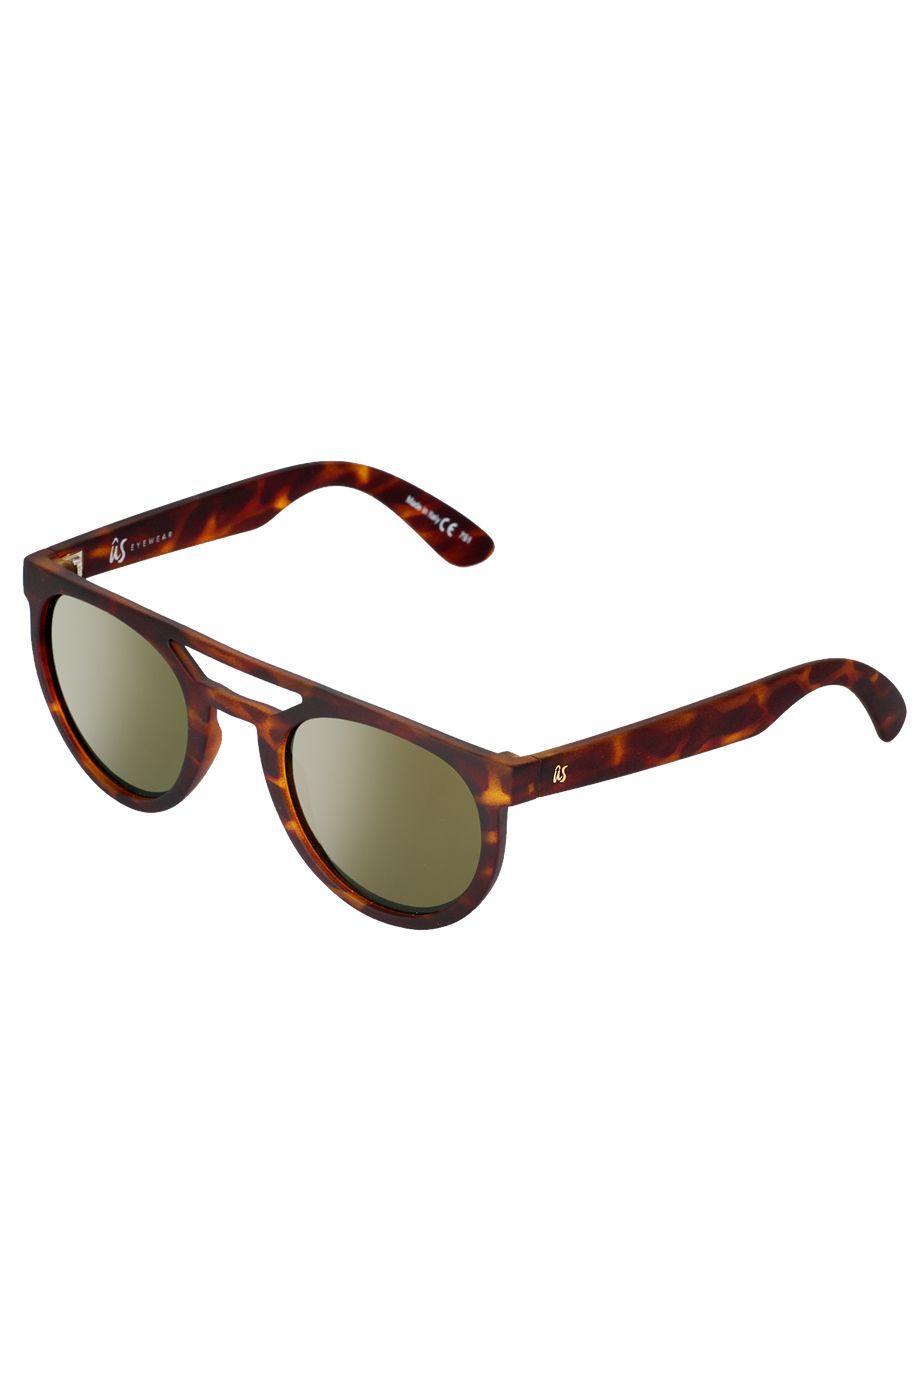 Oculos US NEOS Matte Tort/Grey Gold Chrome